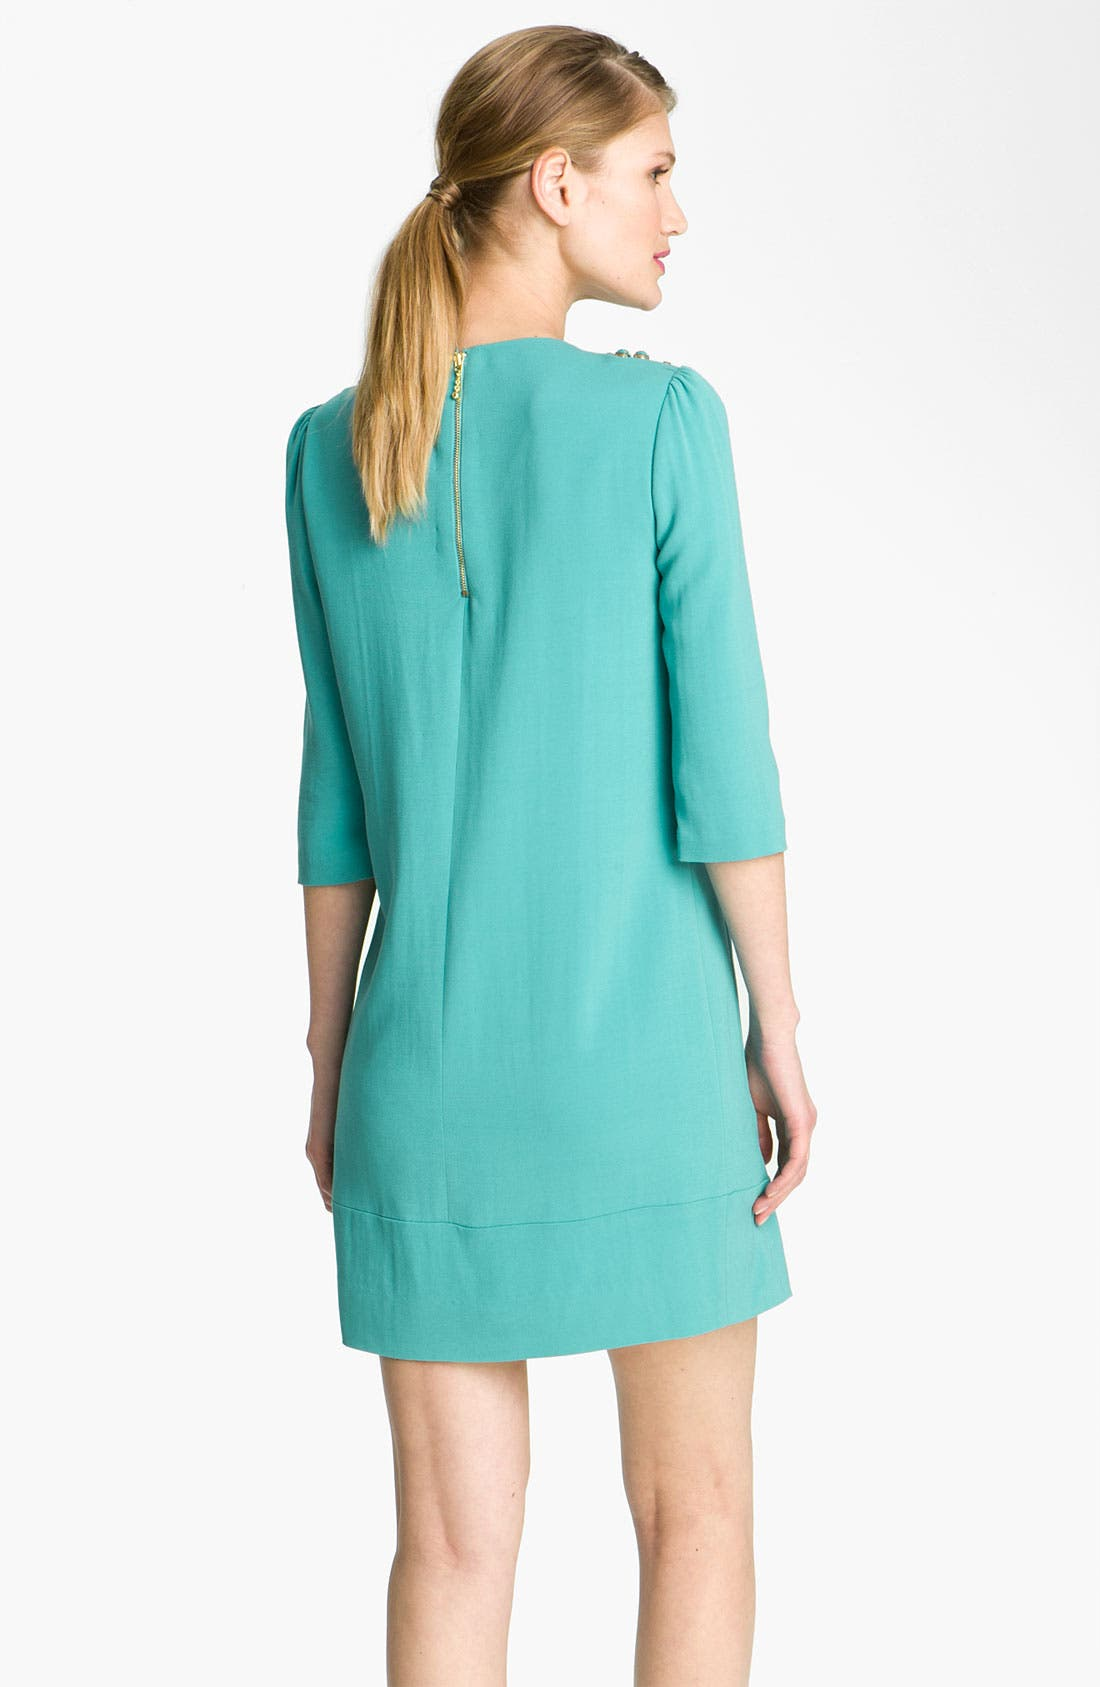 KATE SPADE NEW YORK,                             'vanessa' embellished dress,                             Alternate thumbnail 3, color,                             440